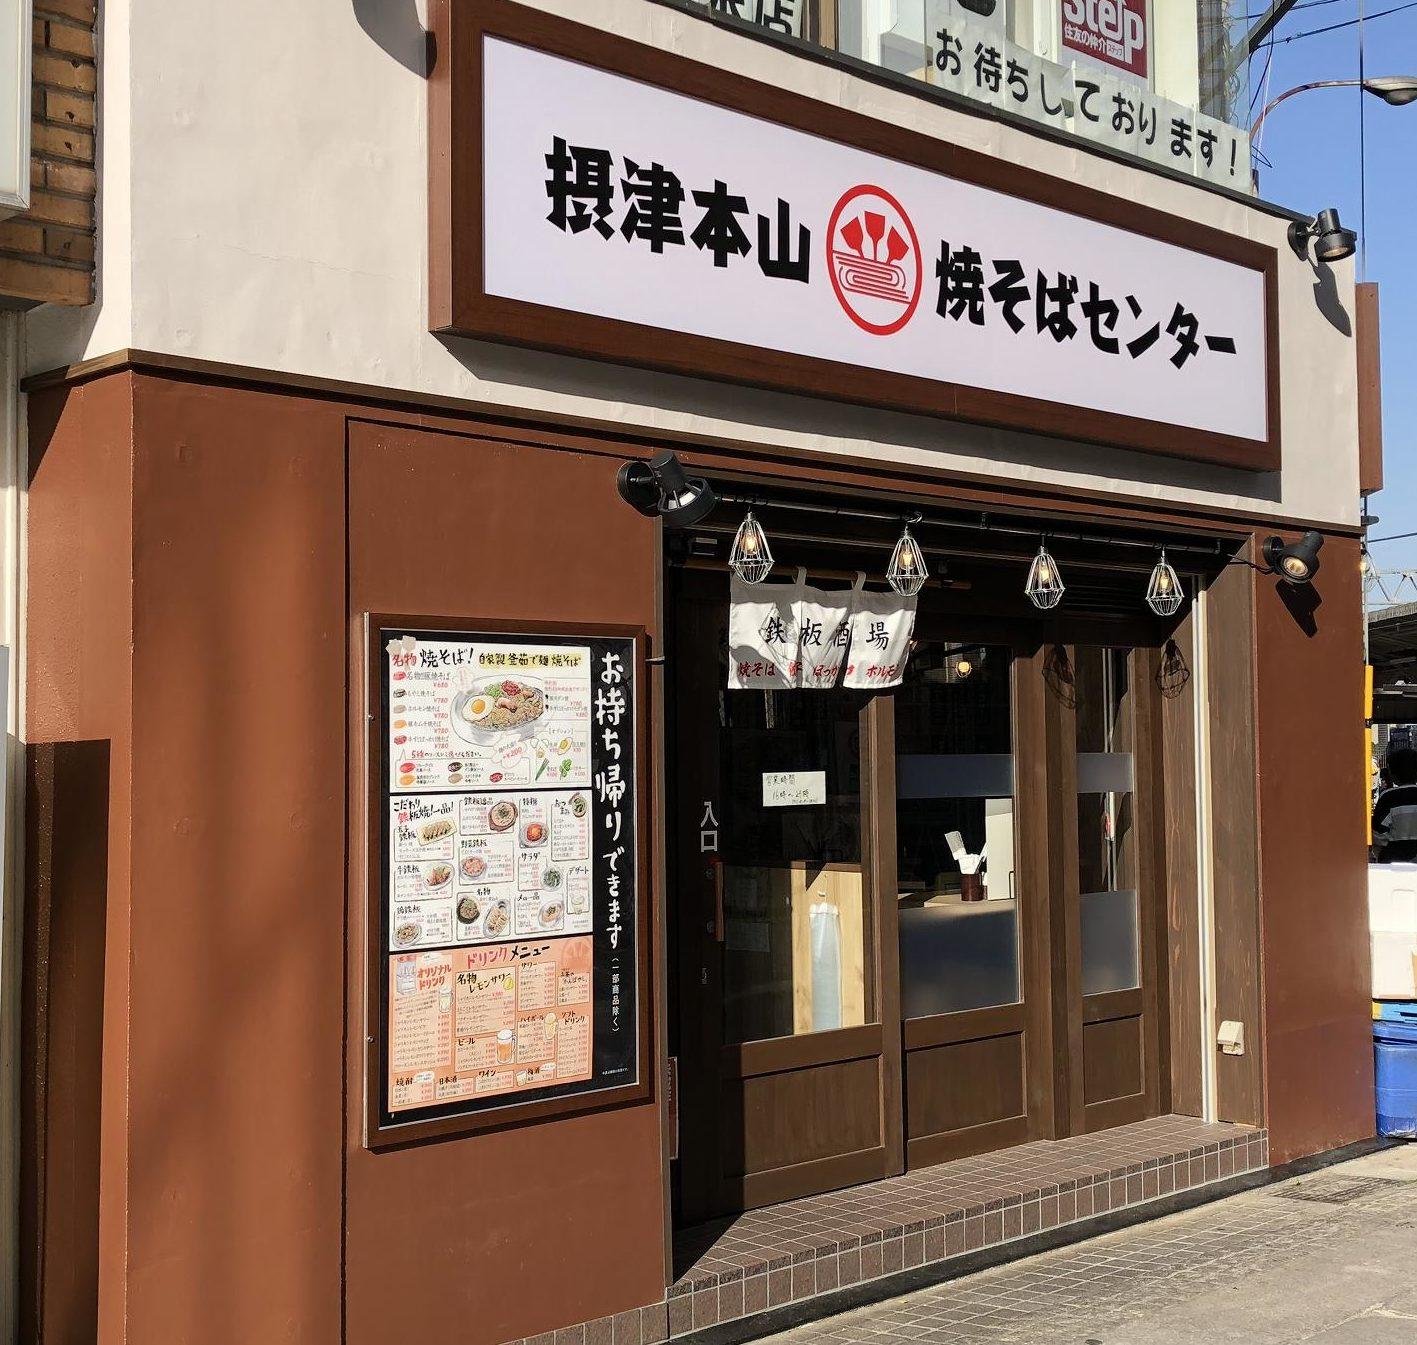 JR摂津本山駅北側に「 #摂津本山焼そばセンター 」がオープンしたので、食べに行ってみた! #新規オープン #摂津本山 #焼そば